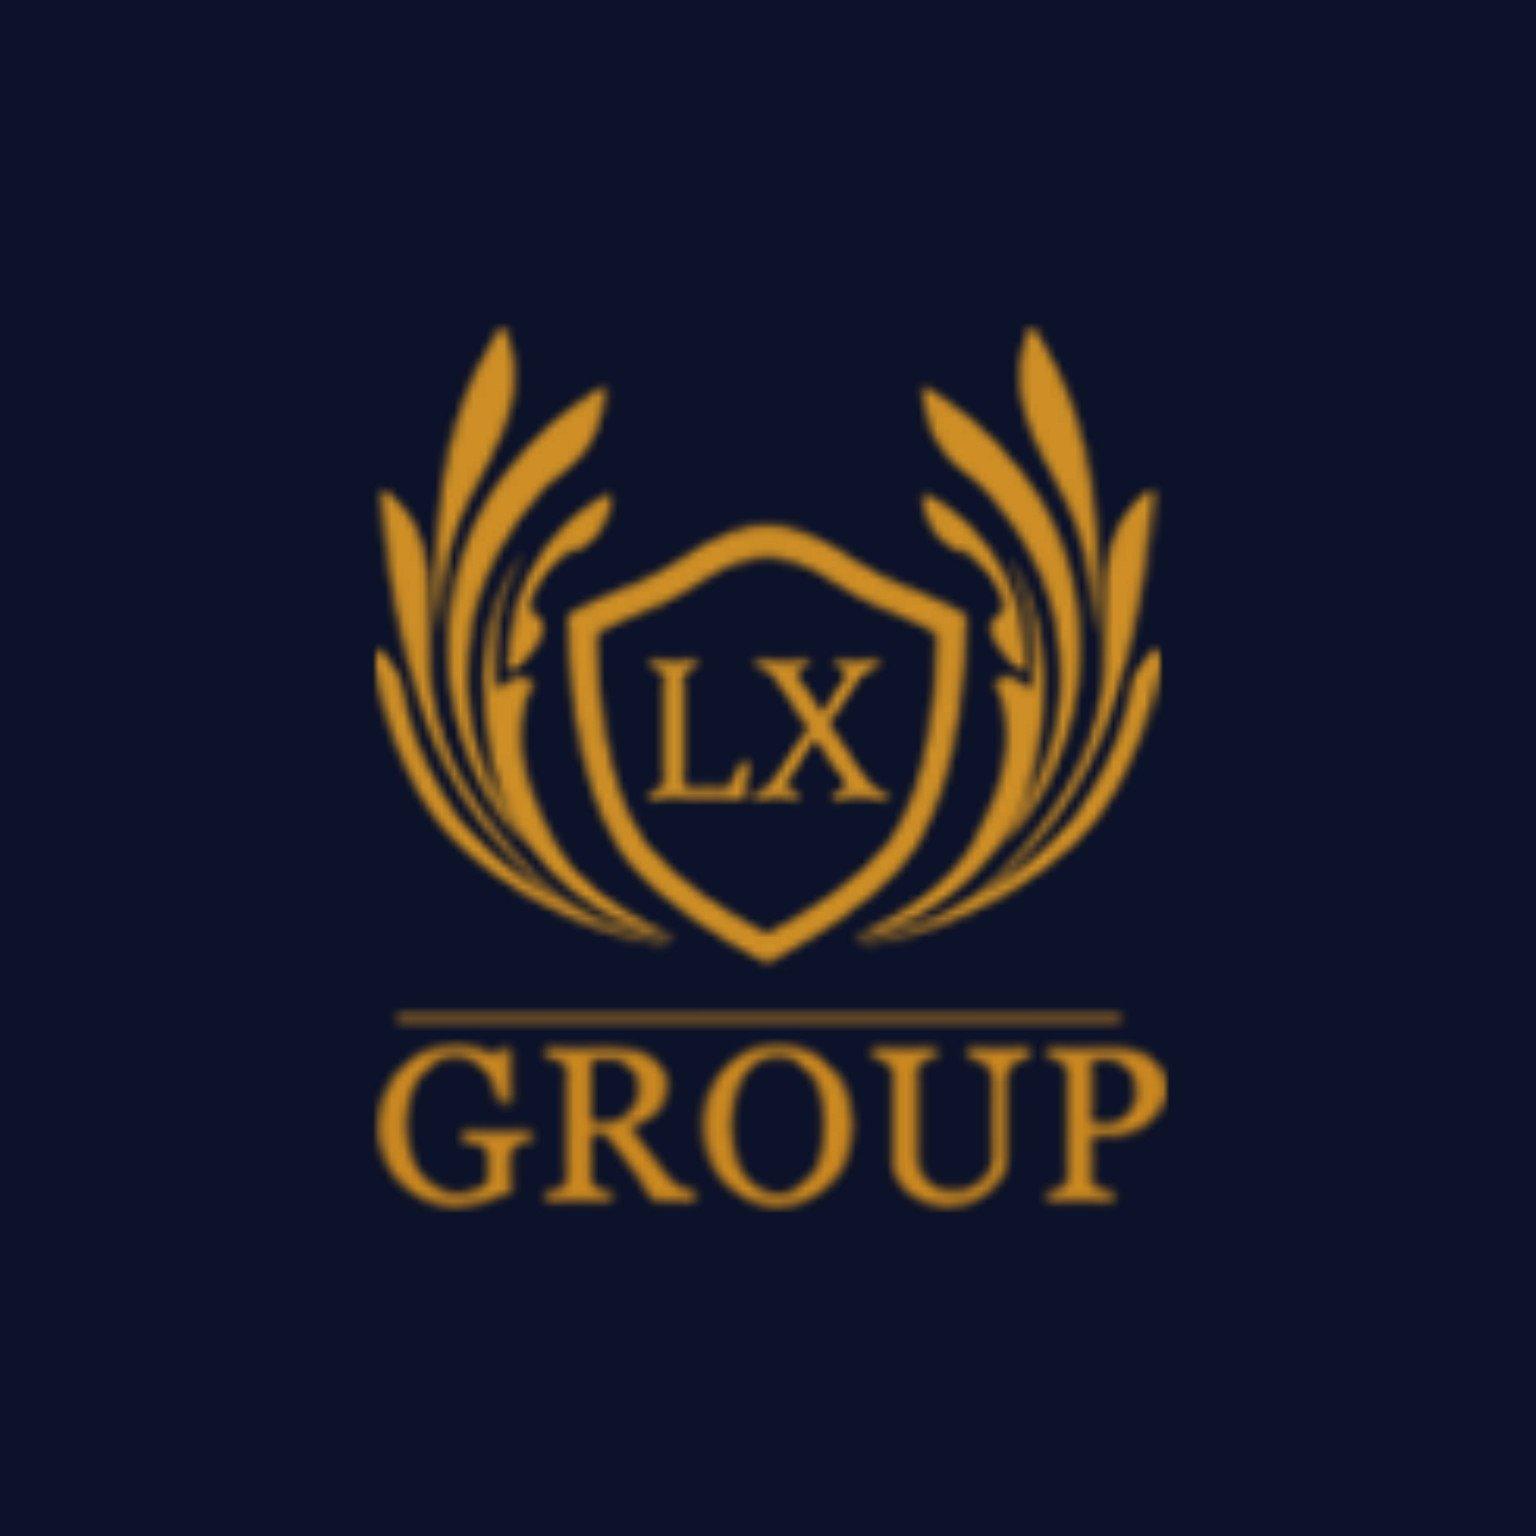 REGISTRASI LXGROUP (@LXGROUPS) | Twitter